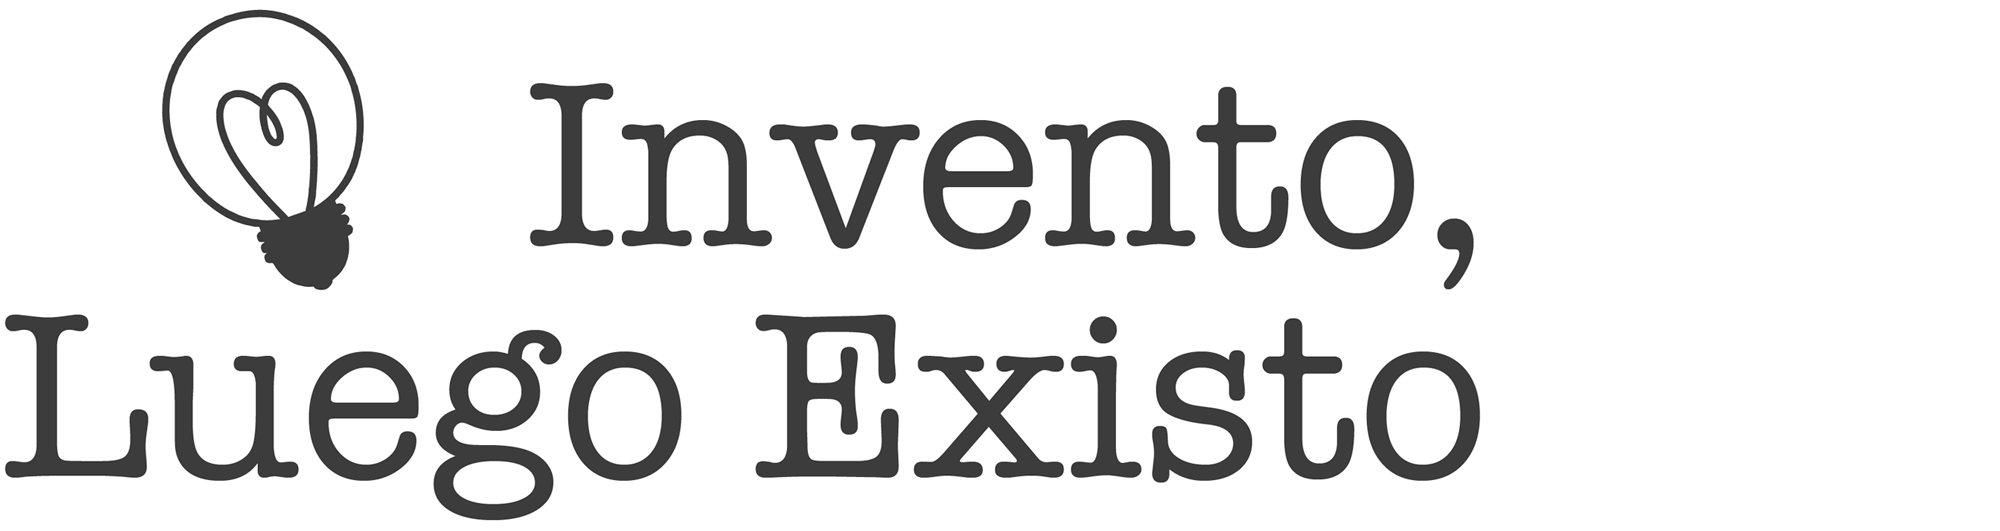 Invento, Luego Existo